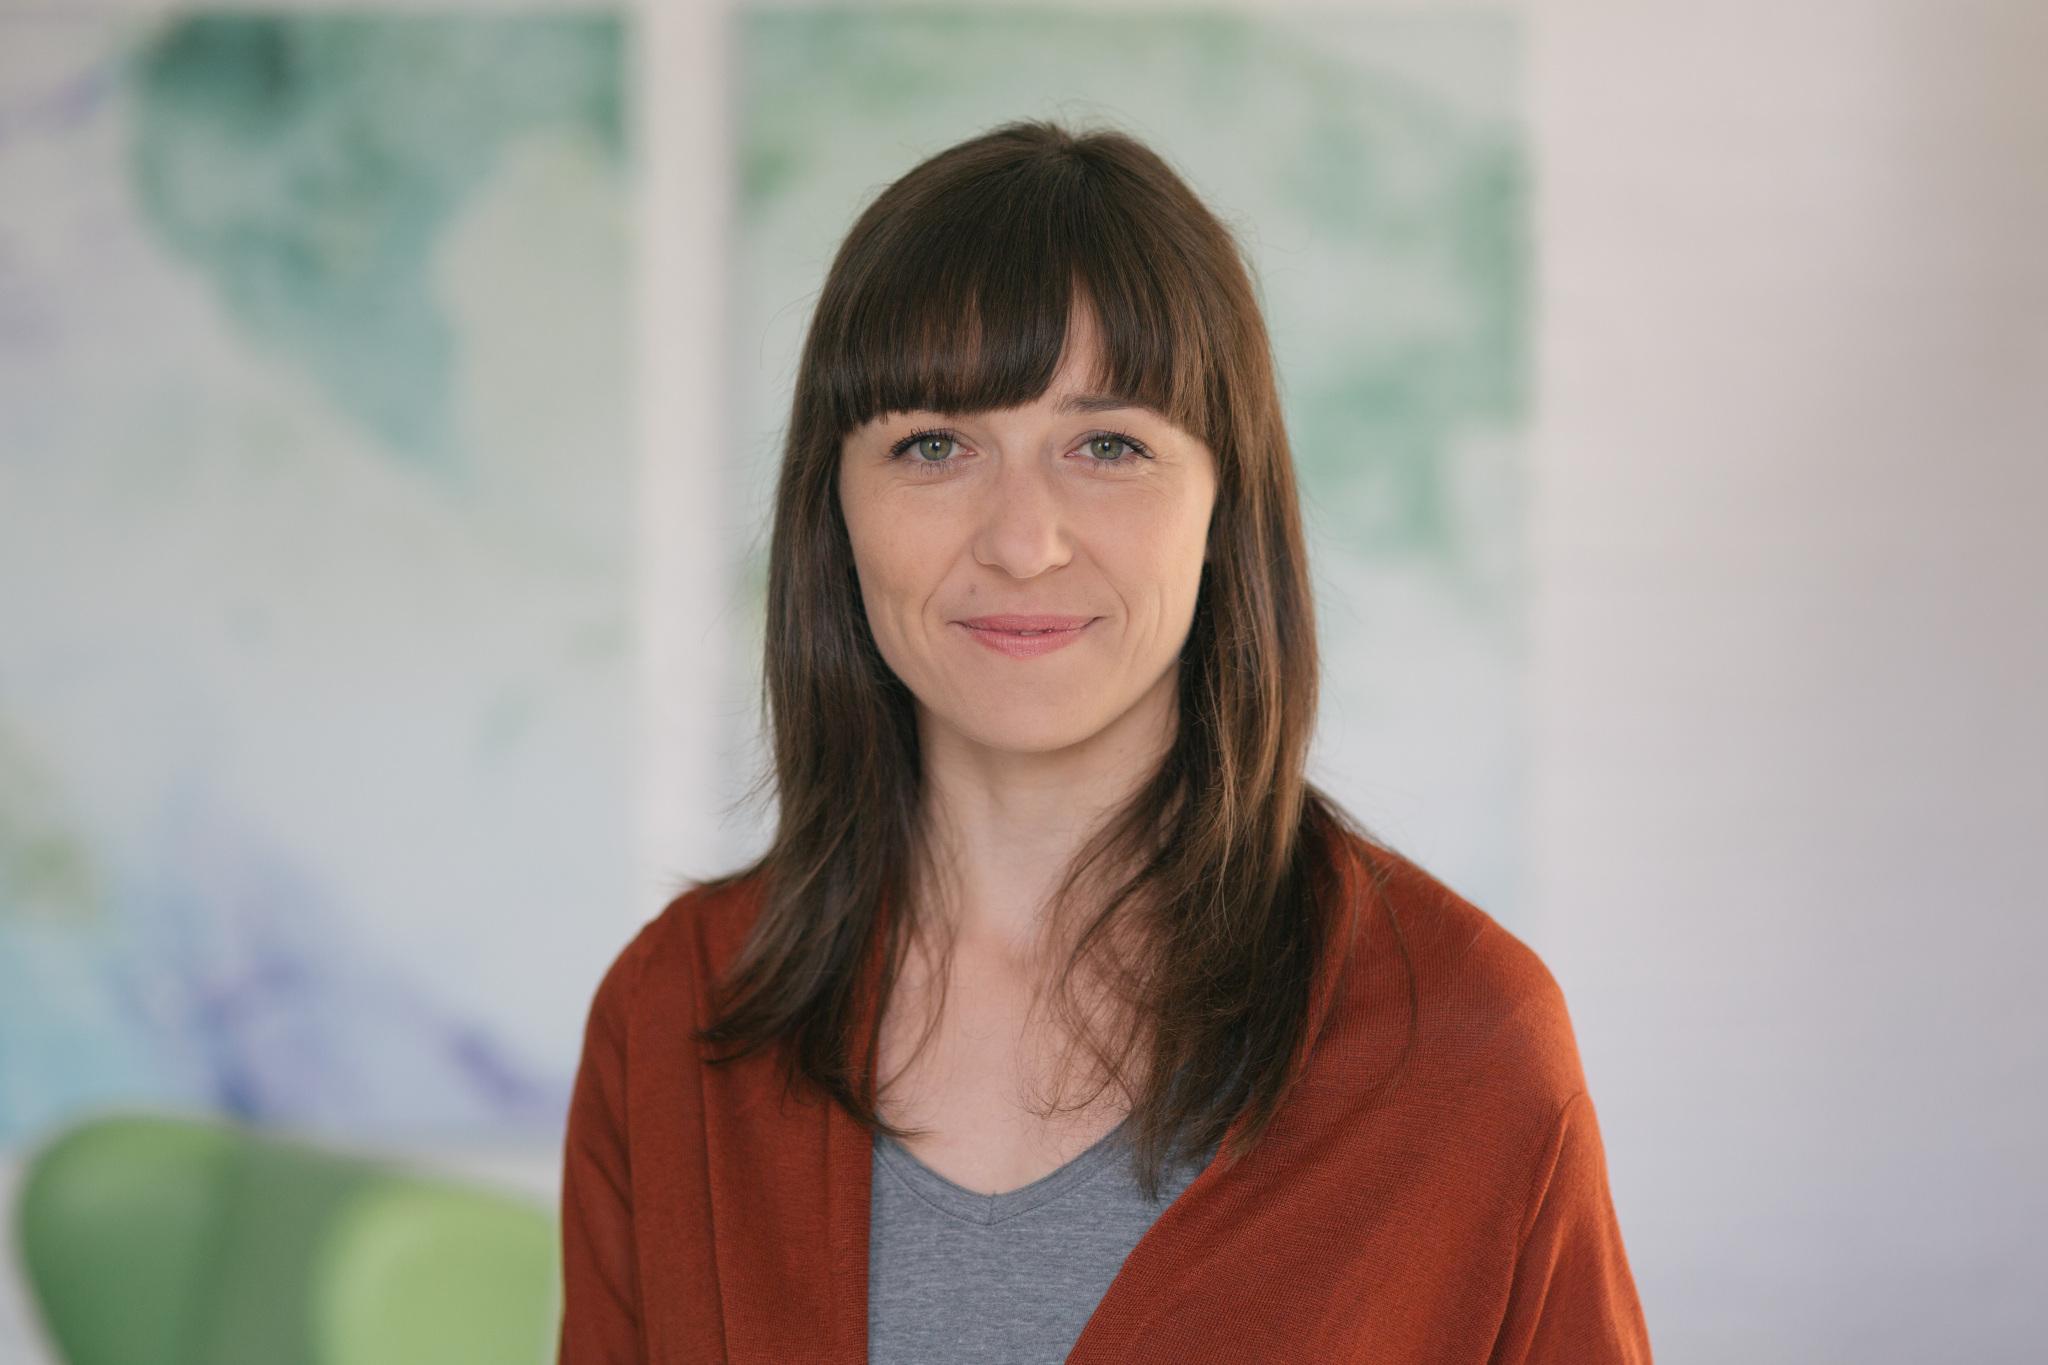 Maria Jakuszko